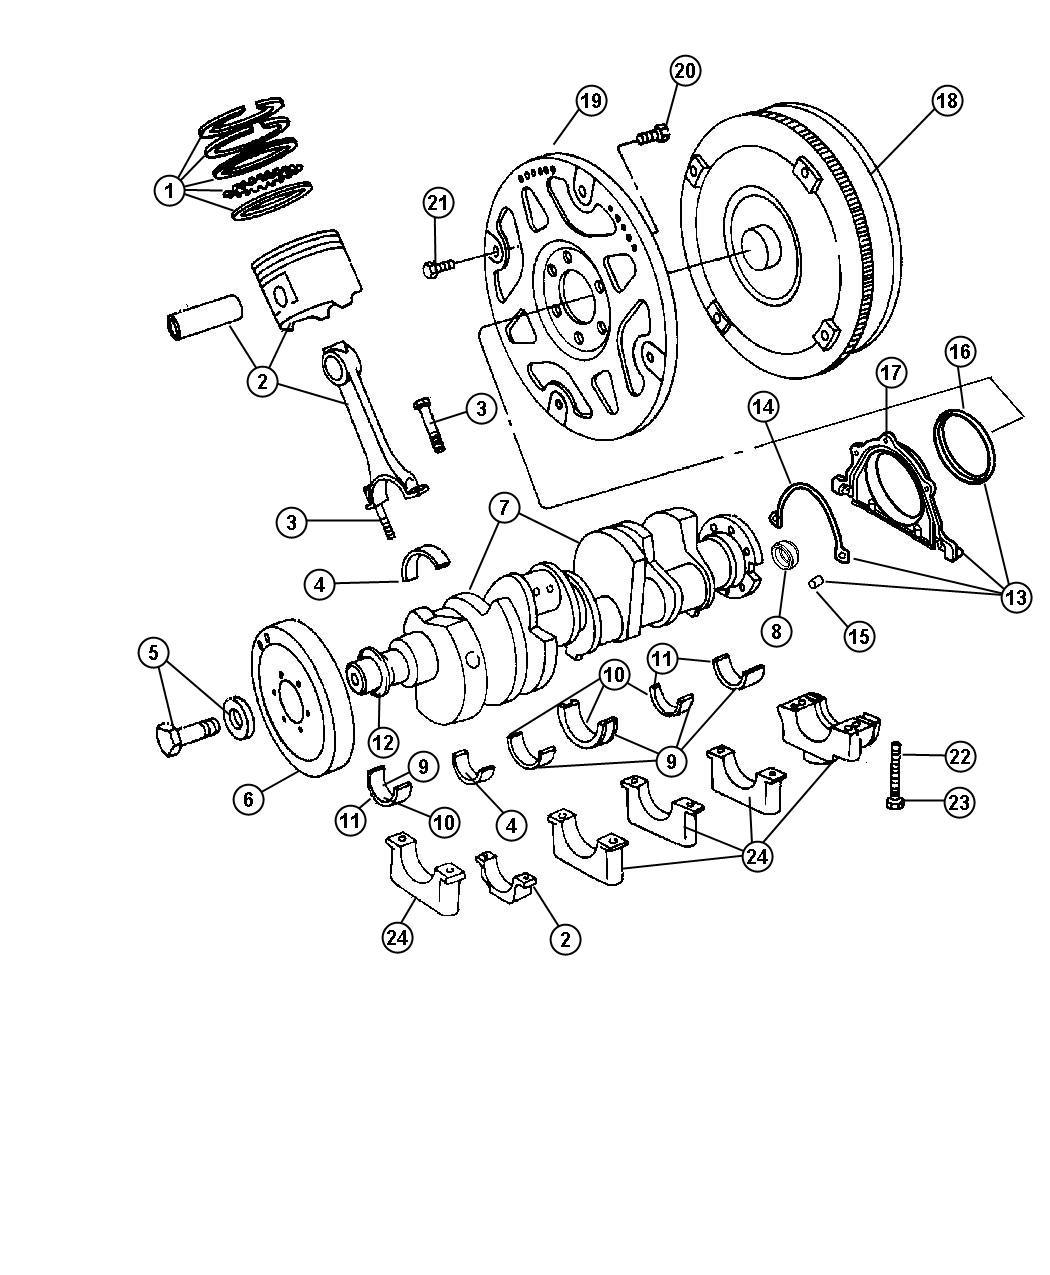 Dodge Bolt Screw Connecting Rod Hex Flange Head